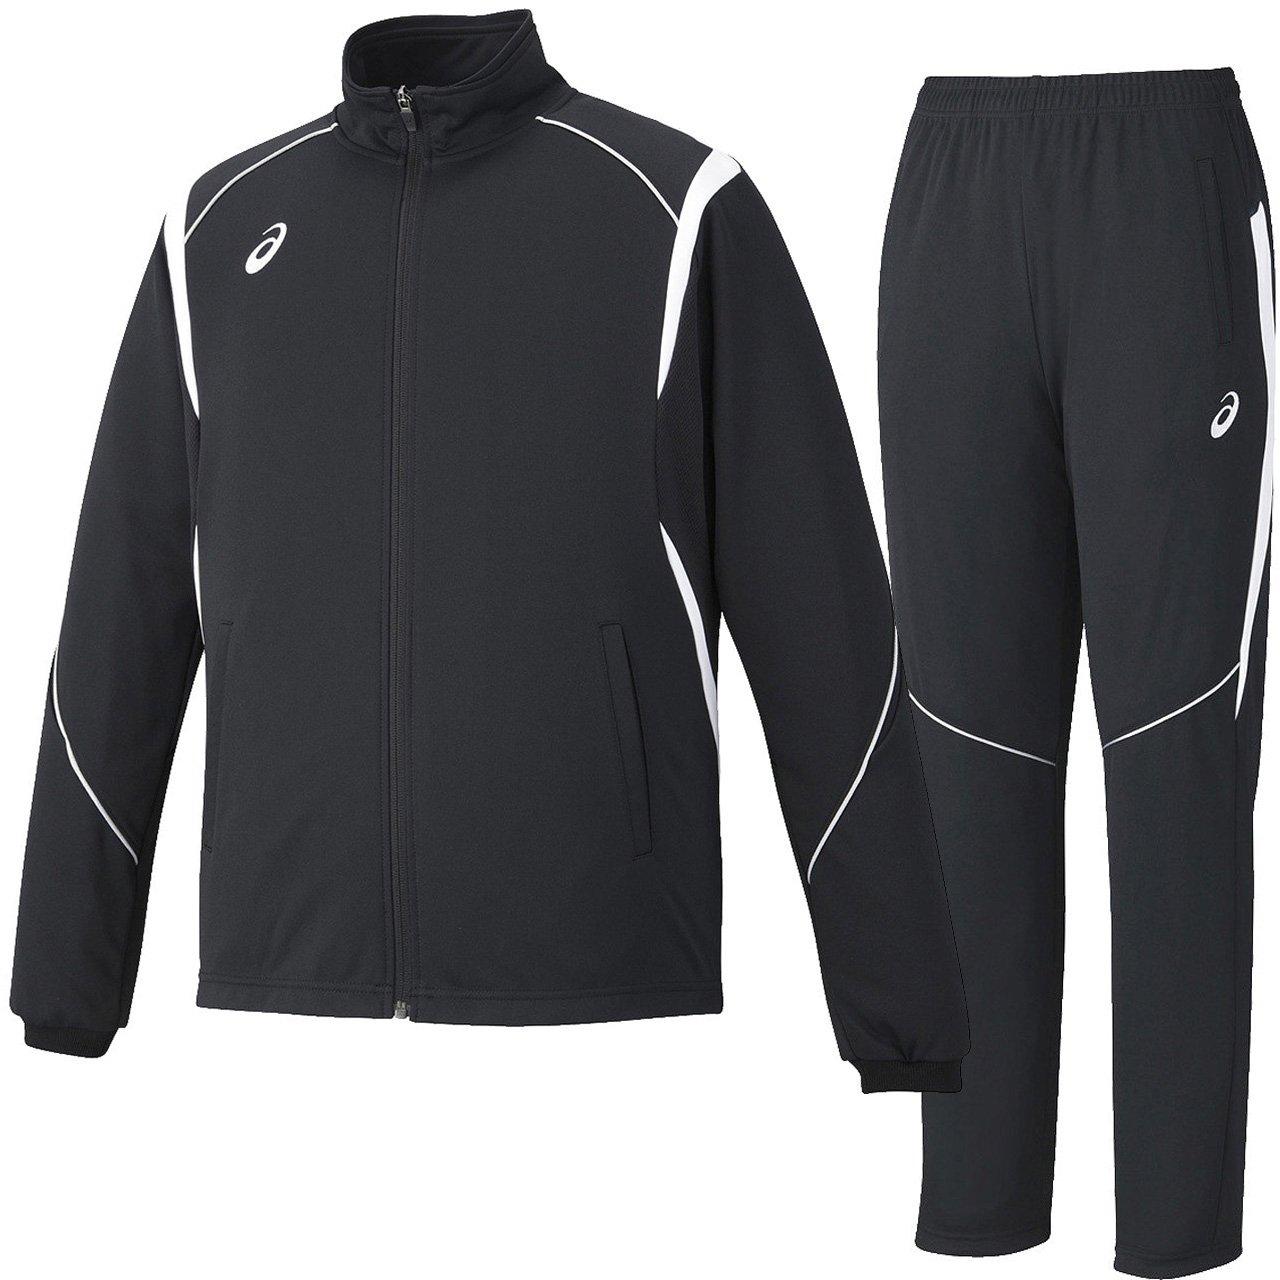 asics(アシックス) トレーニング ジャケット パンツ 上下セット 【メンズ】 (XAT143/XAT243) B01C76COMQ 日本 M-(日本サイズM相当)|ブラック/ホワイト ブラック/ホワイト 日本 M-(日本サイズM相当)